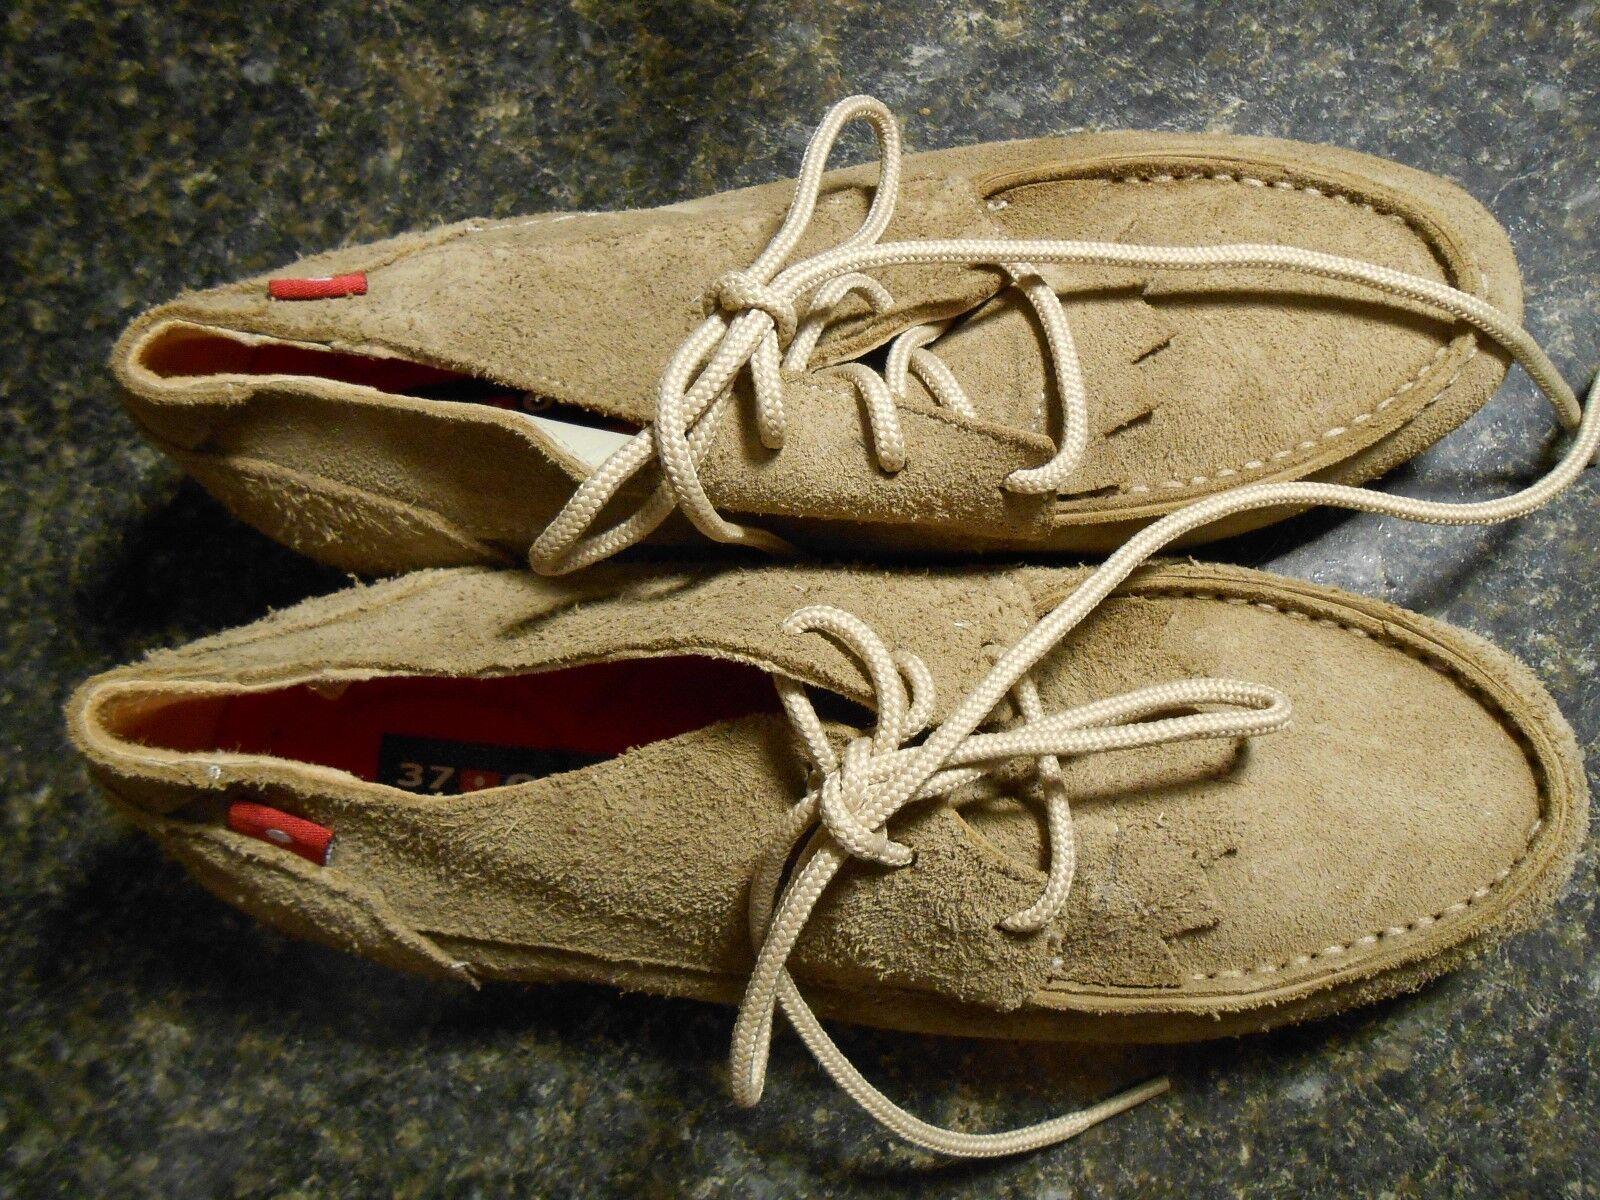 Oliberte tan suede Golia chukka boots display/sample 7M B NEU no box save